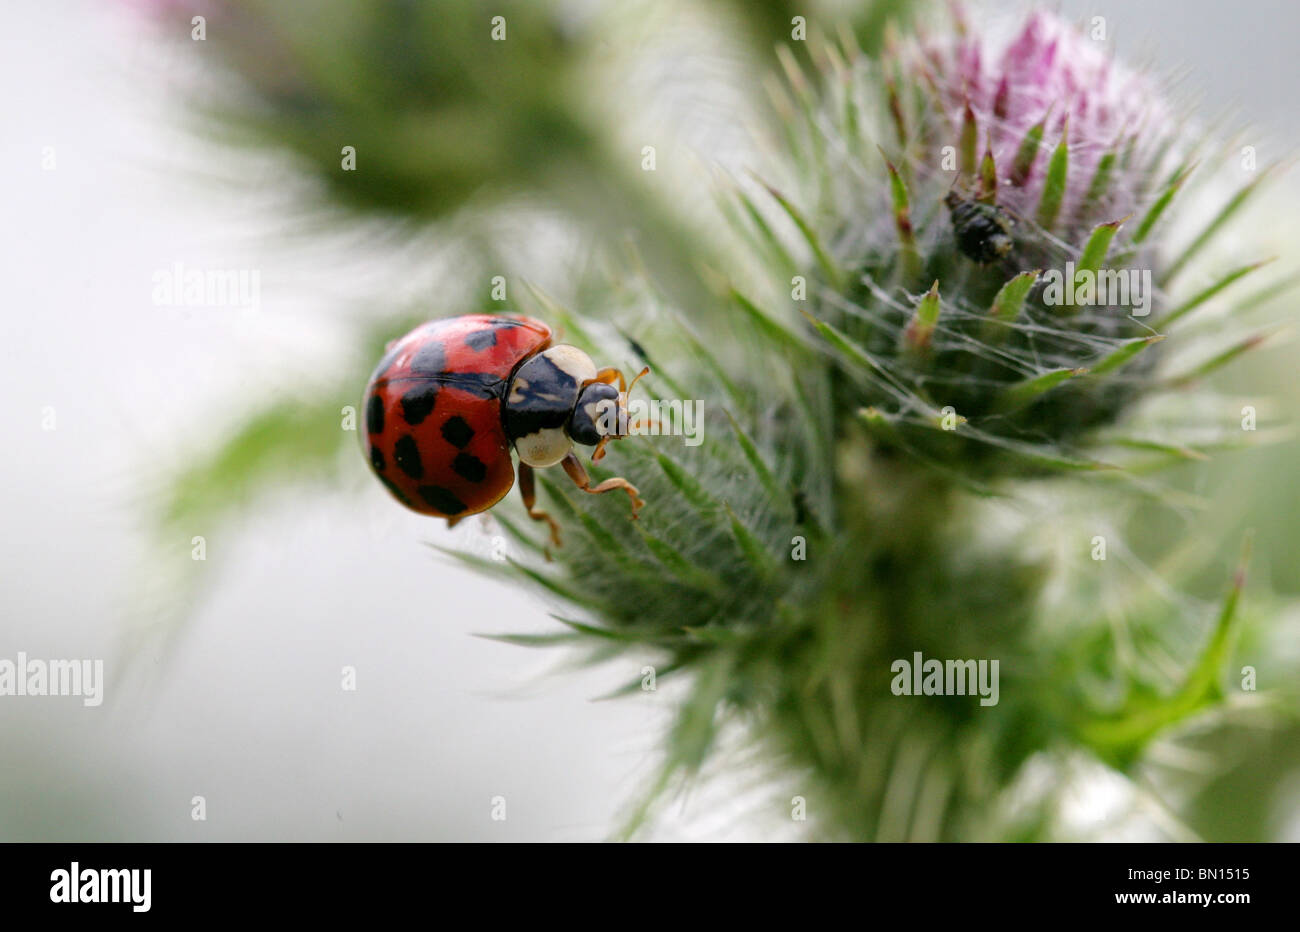 Seventeen Spot Harlequin Ladybird Beetle, Harmonia axyridis, Coccinellidae, Coleoptera - Stock Image